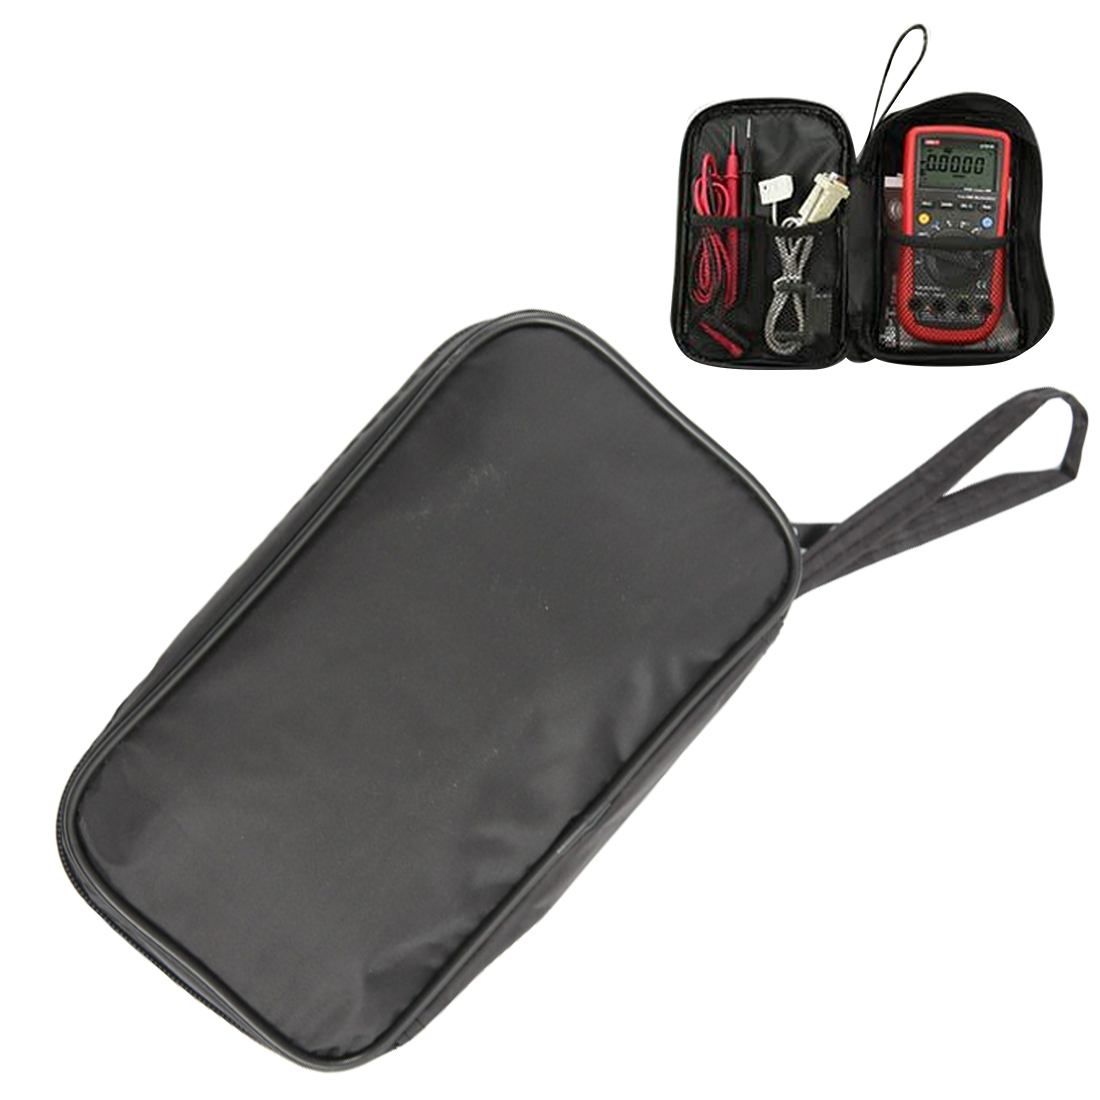 Multimeter Black Canvas Bag Waterproof Tools Bag For UT61 Series Digital Multimeter Cloth Durable 20*12*4cm